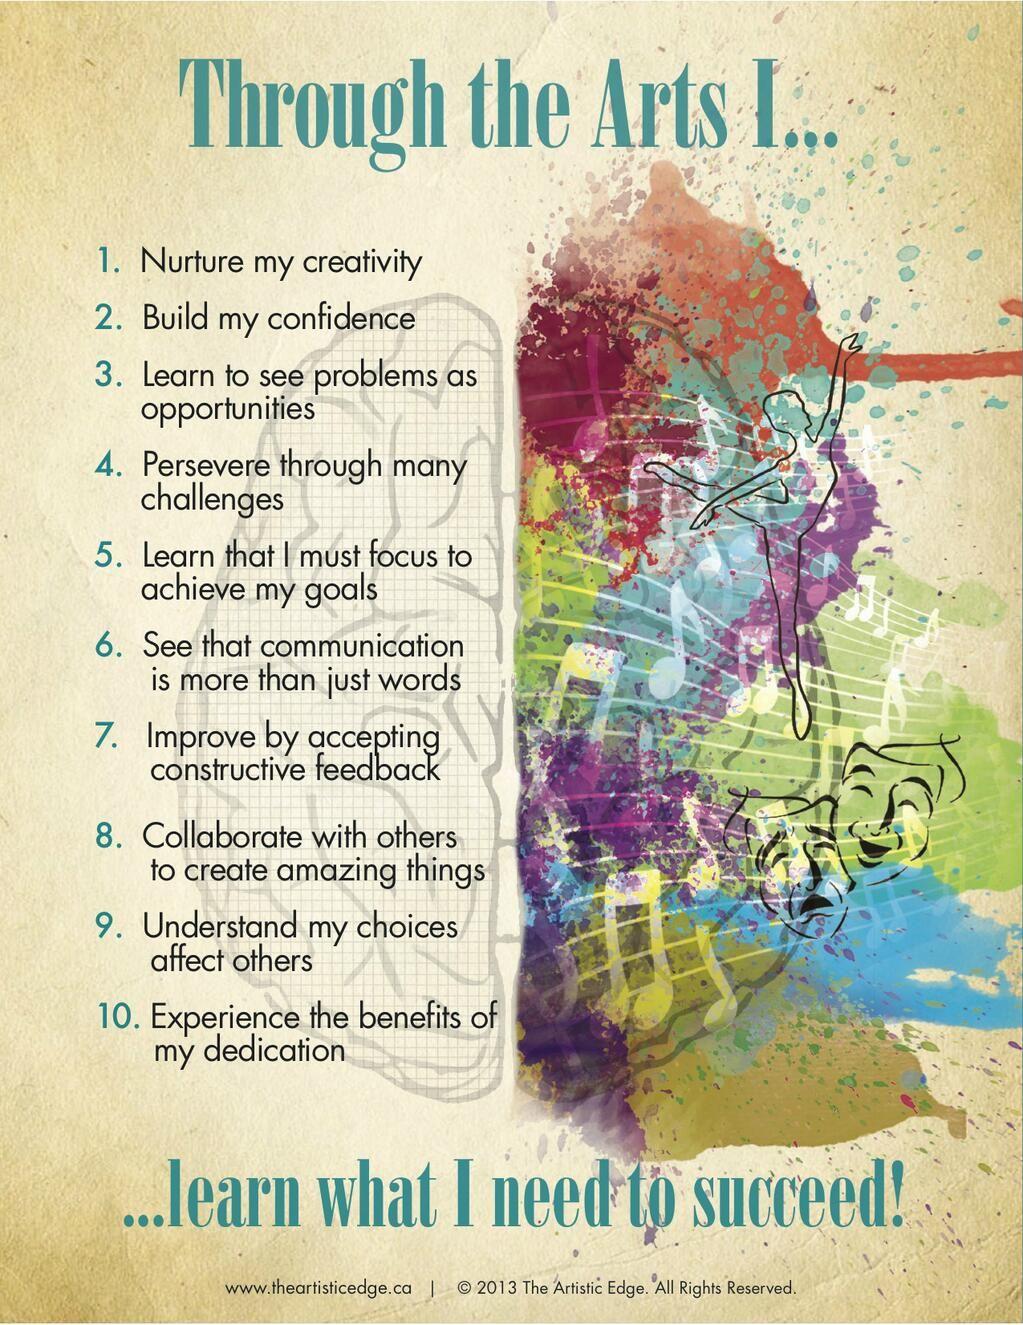 Lisa Phillips On Twitter Art Room Posters Art Classroom Art Ideas For Teens Arts live education room